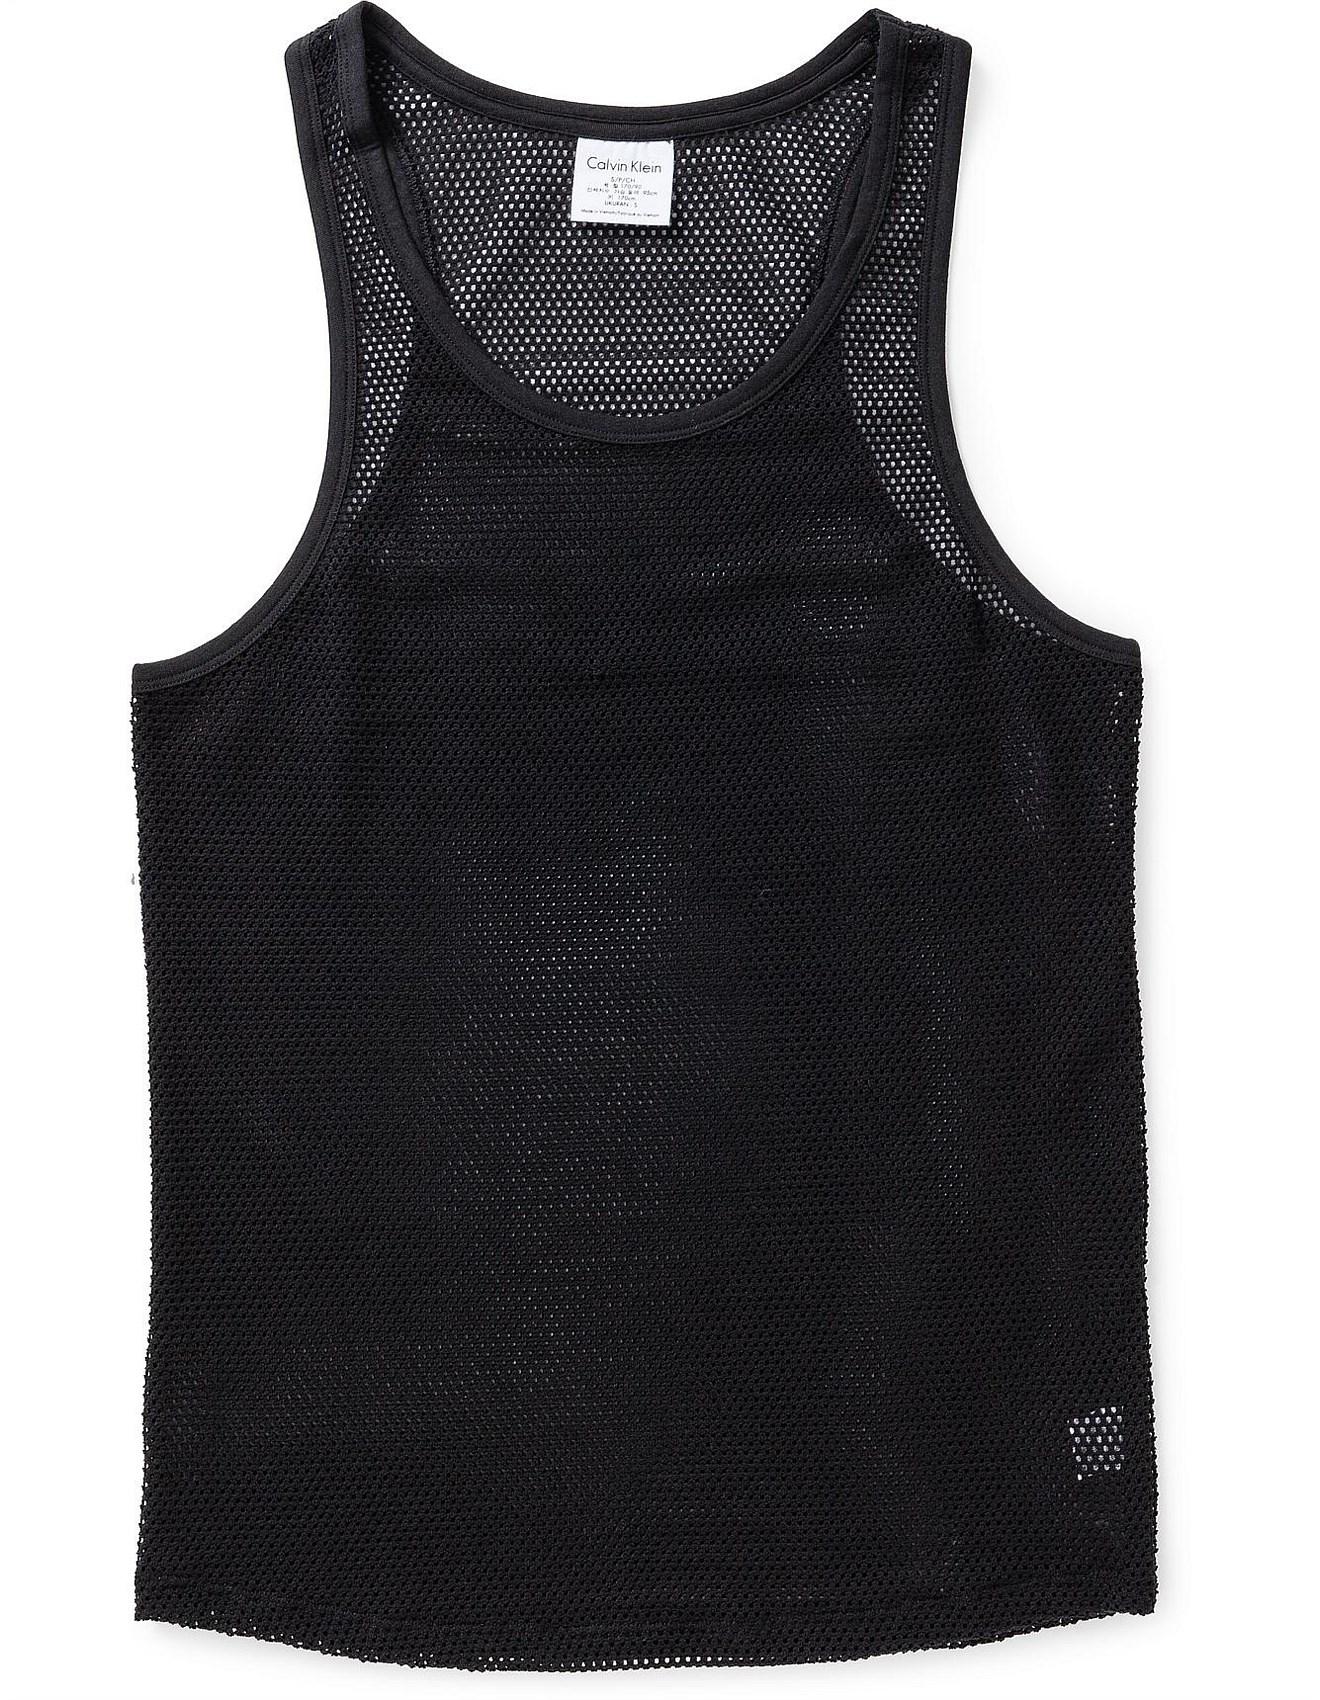 d63d70f3ce7d32 Fashion Offer - BODY MESH TANK